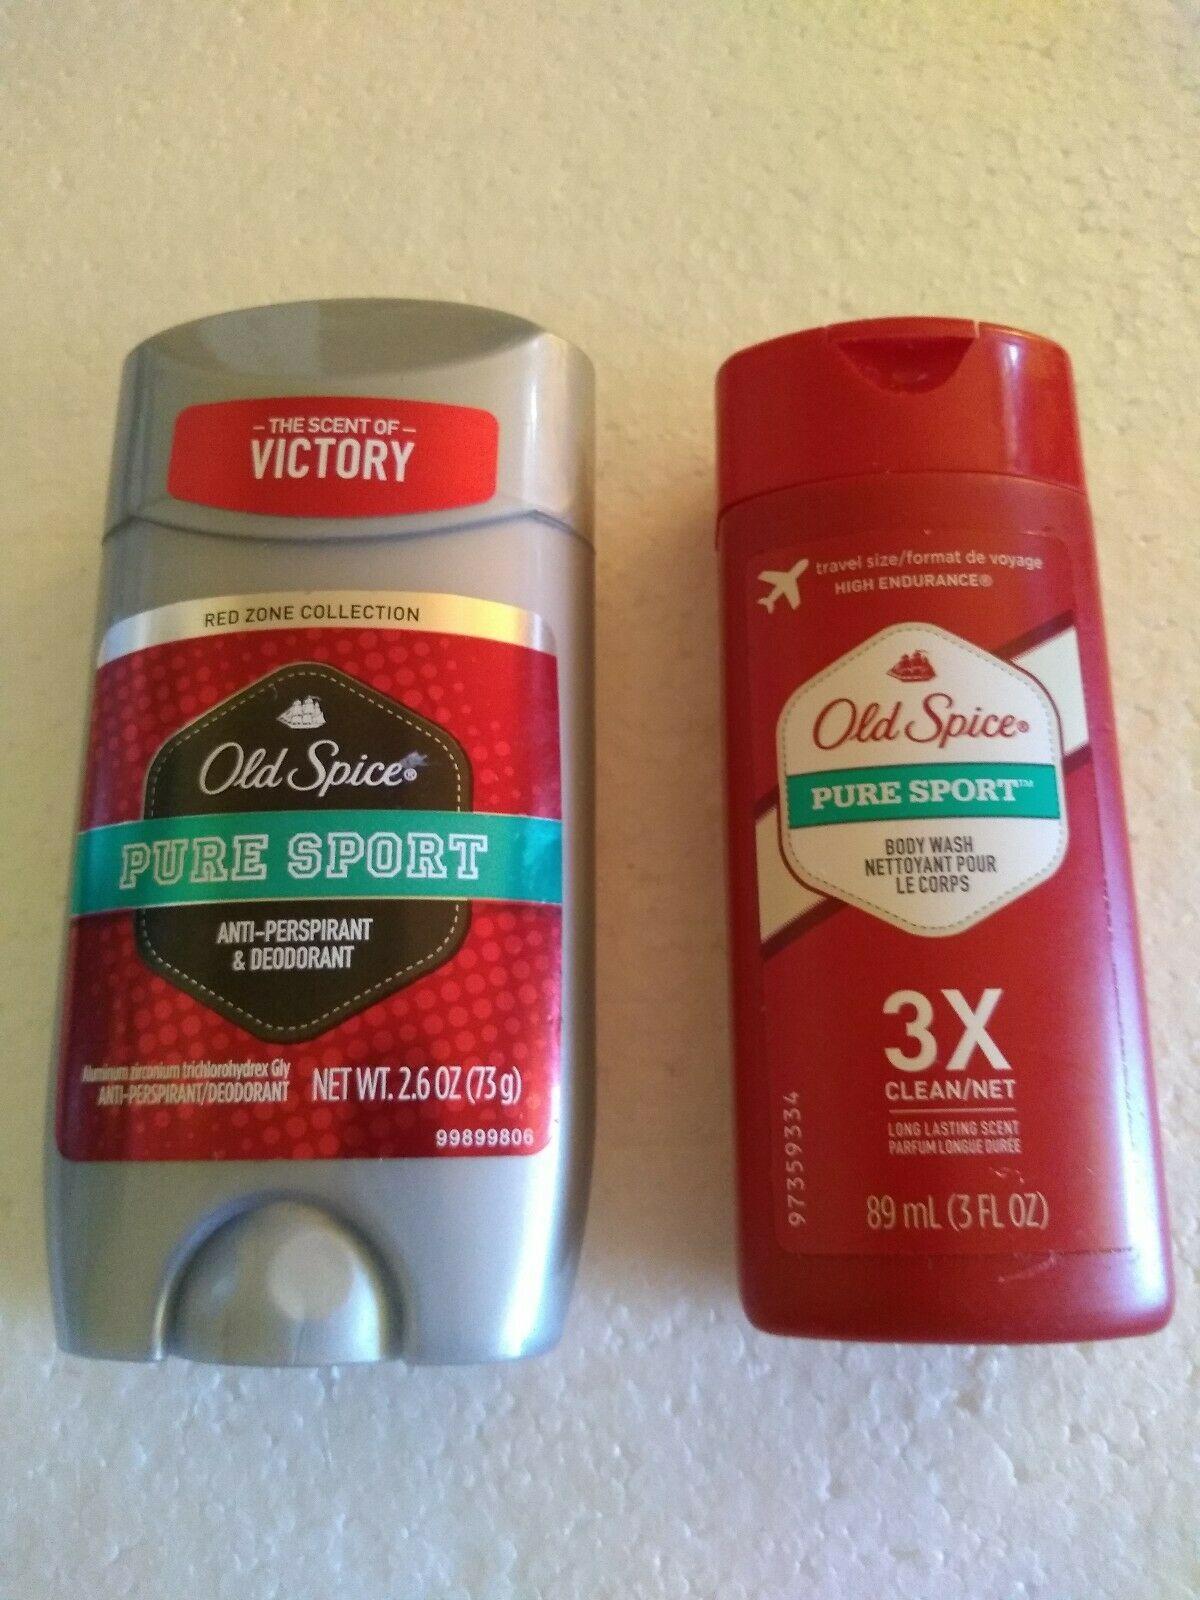 Old Spice Pure Sport  Deodorant Red Zone 26 Oz + Travel Size 3X Bodywash 2 PC